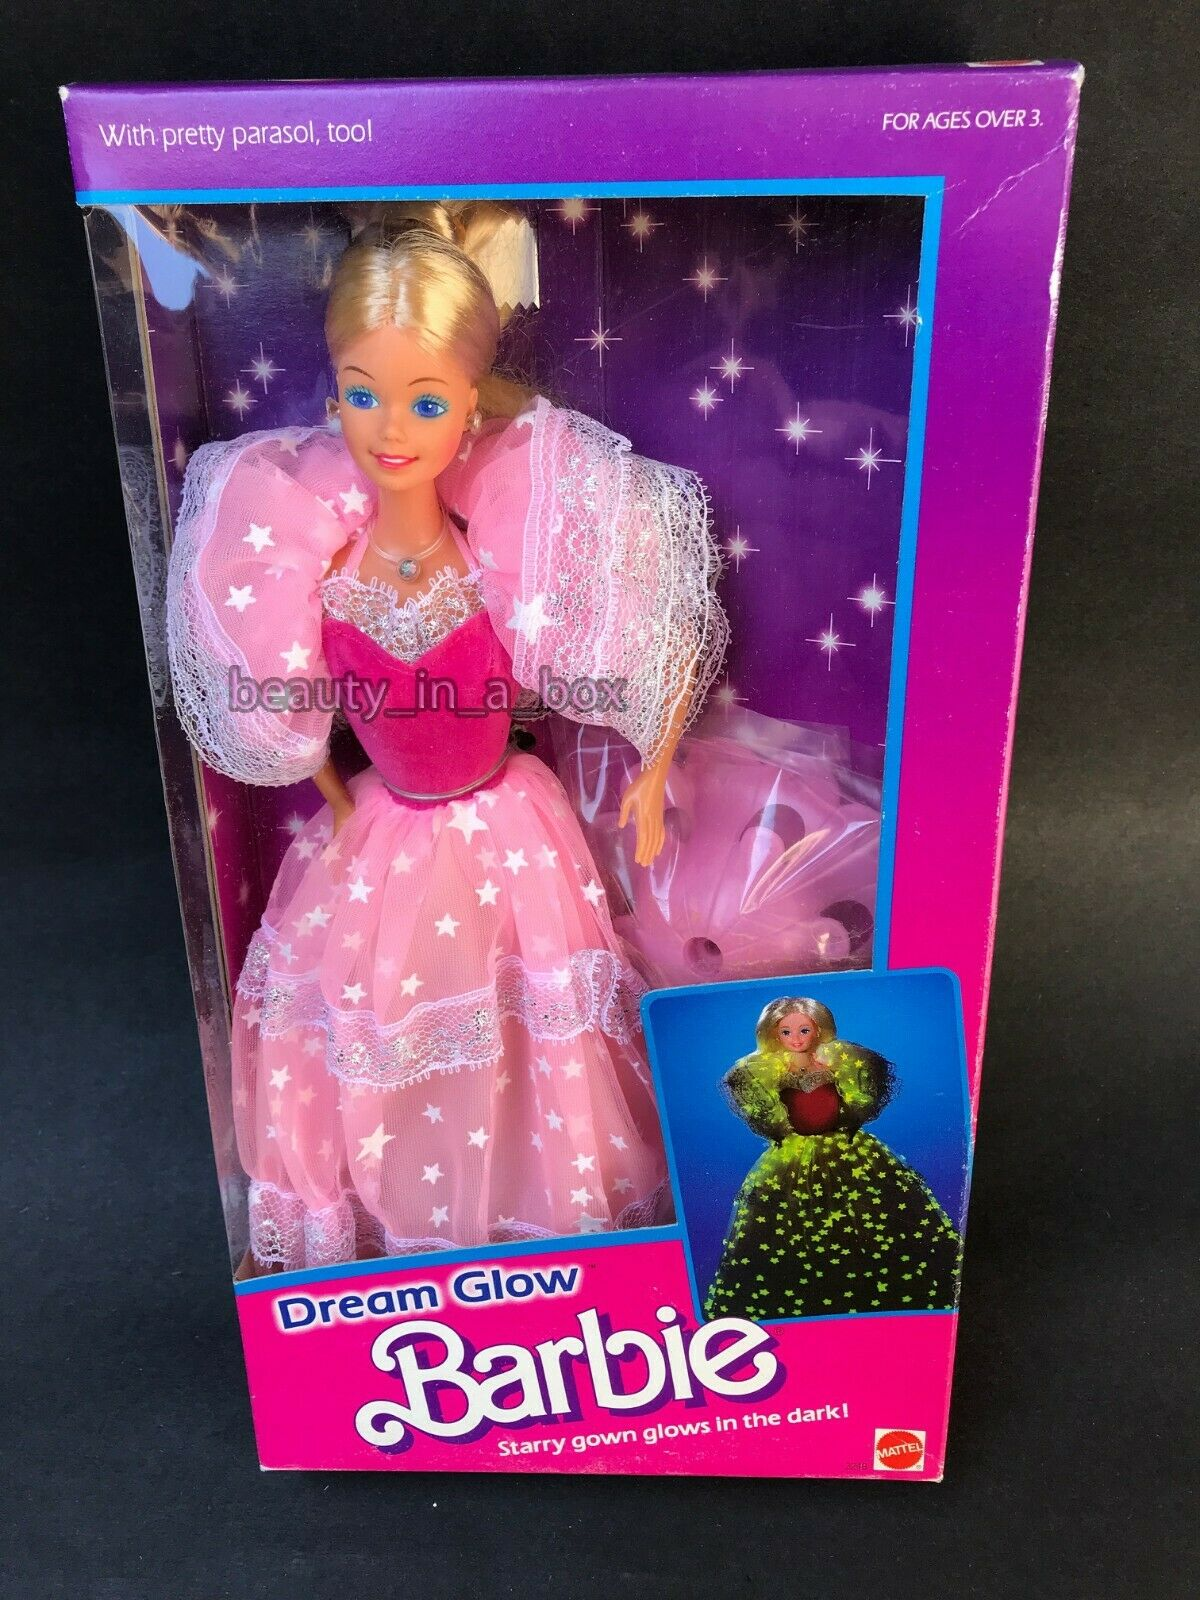 Dream Glow Barbie Doll Vintage 1985 Classic NRFB  EXC